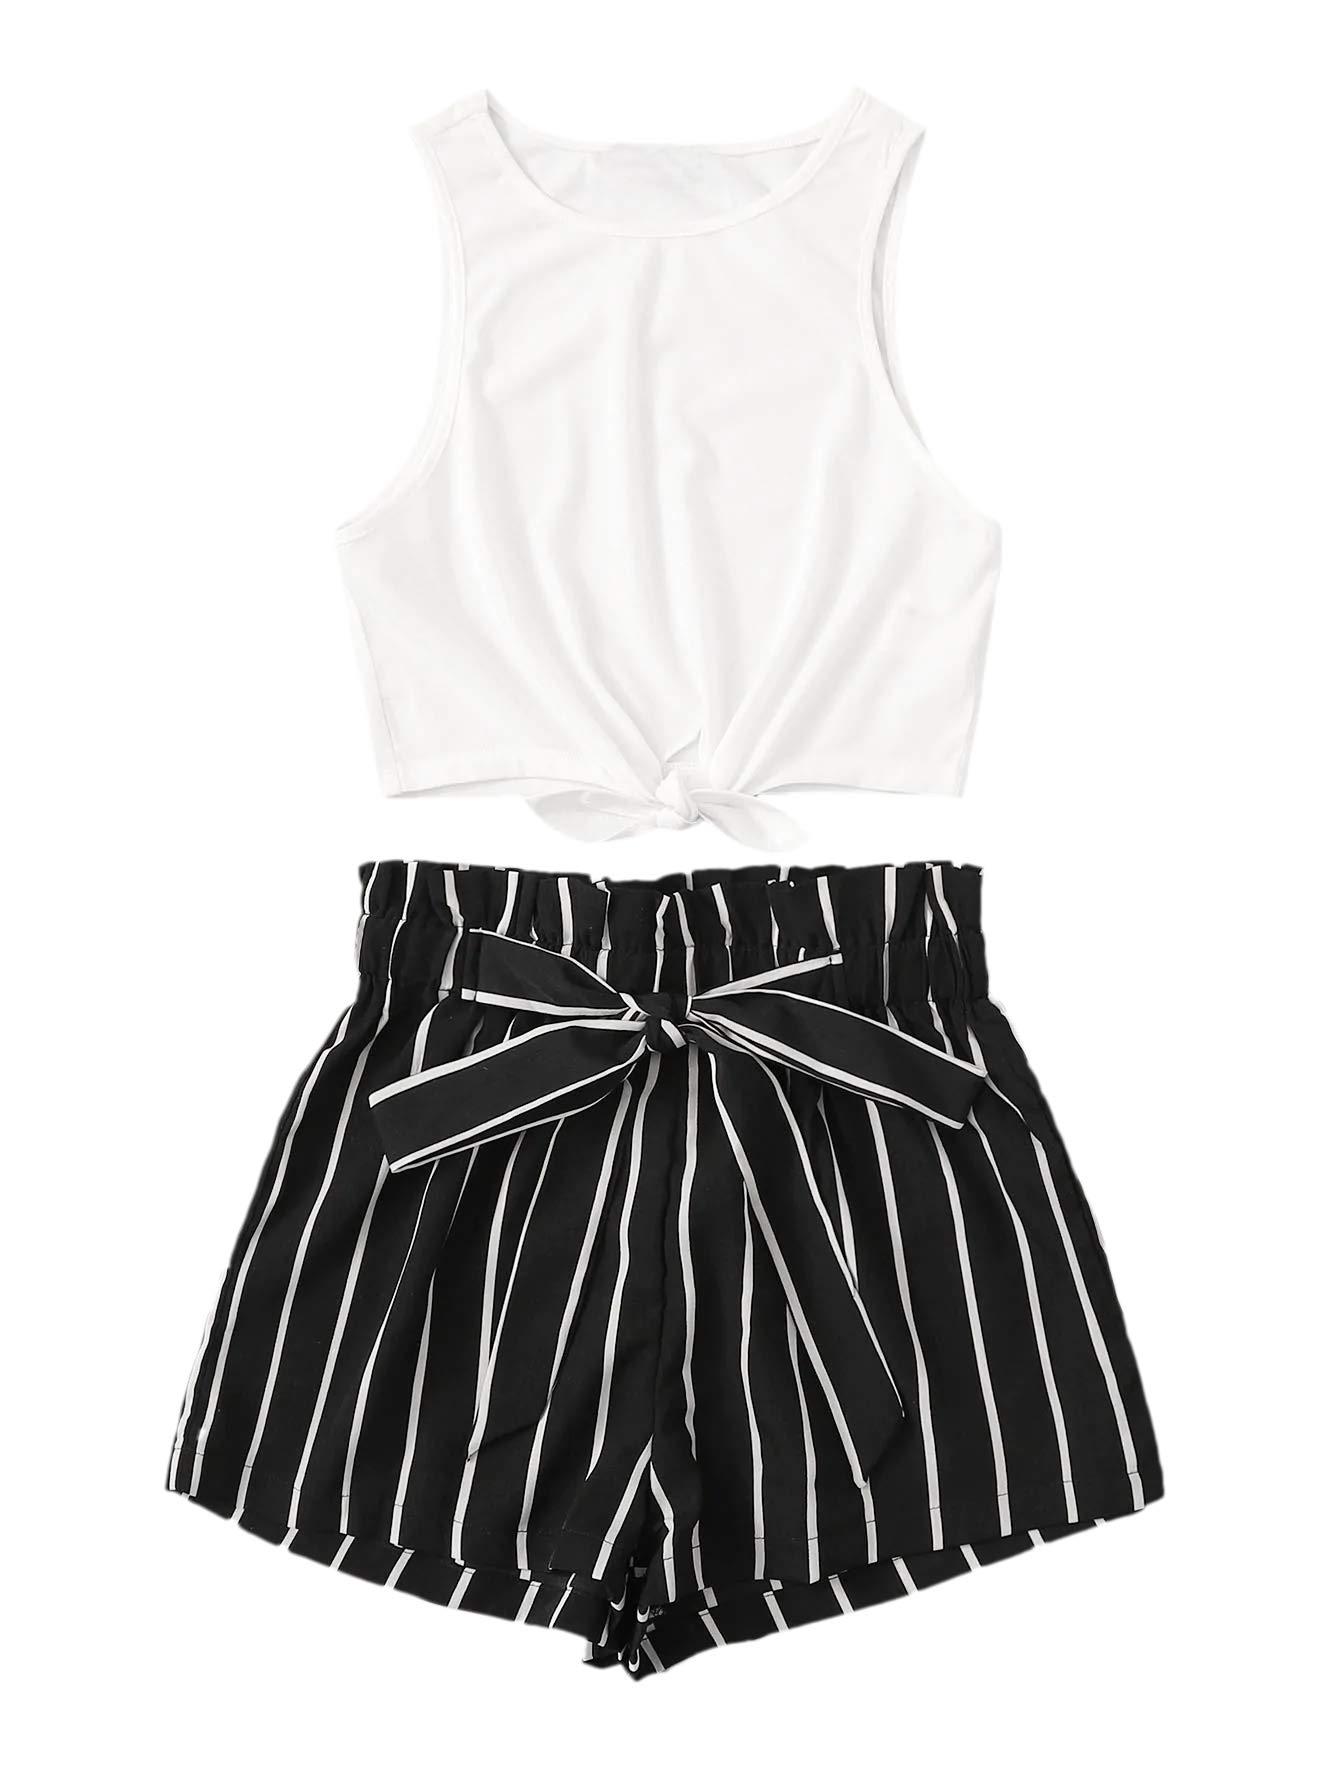 SweatyRocks Women's 2 Piece Casual Striped Print Crop Tank Top with Shorts Set White M by SweatyRocks